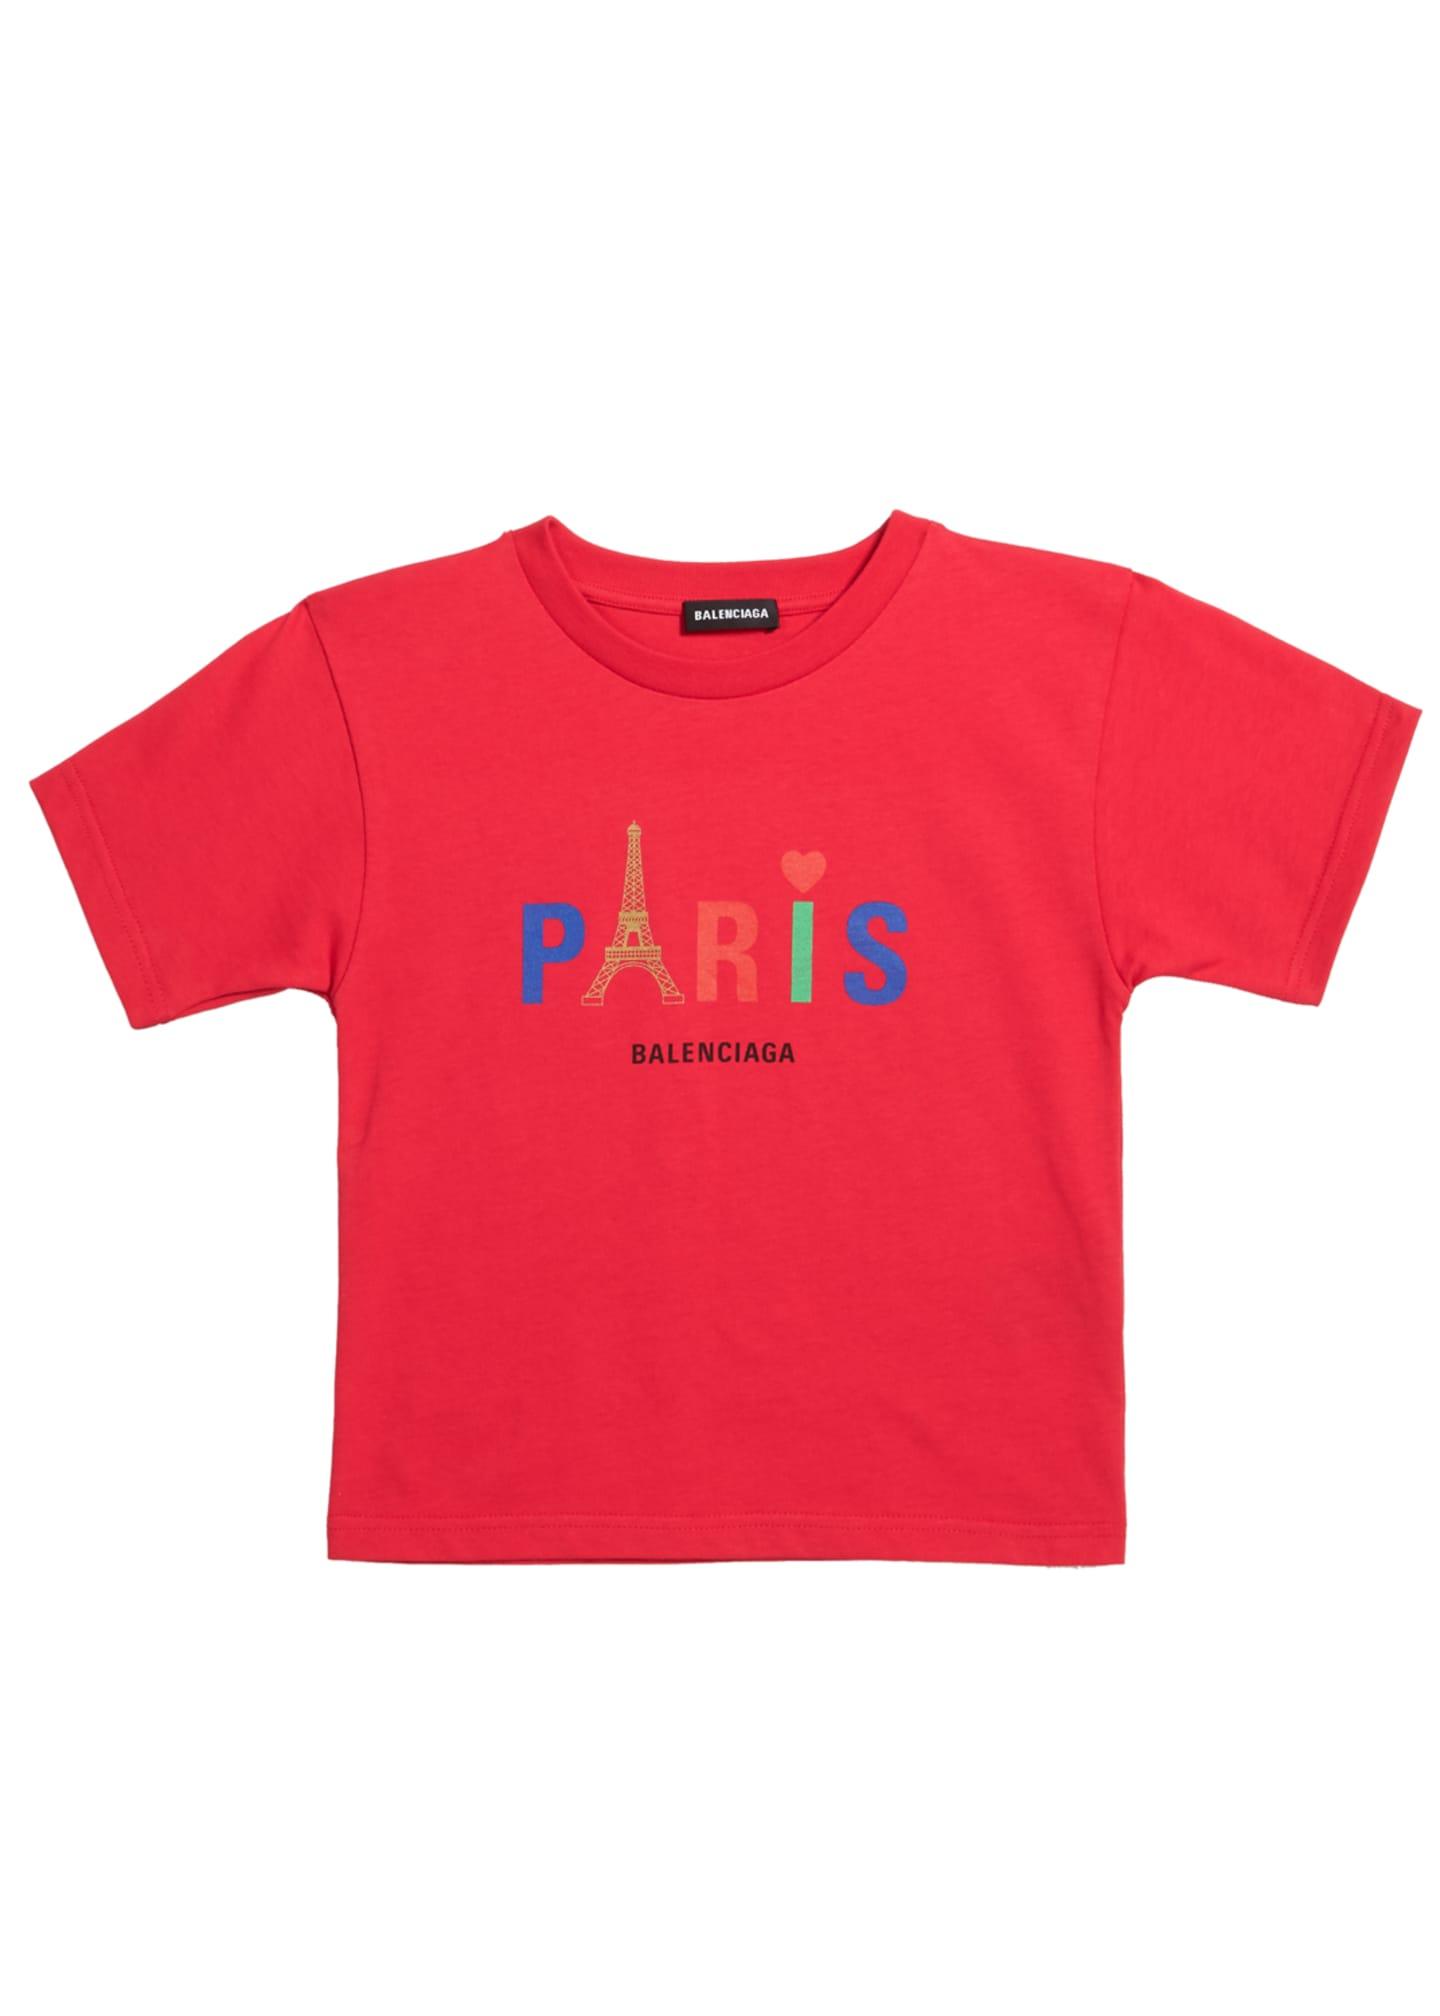 Balenciaga Kid's Paris Multicolor Icon Logo Short-Sleeve T-Shirt,